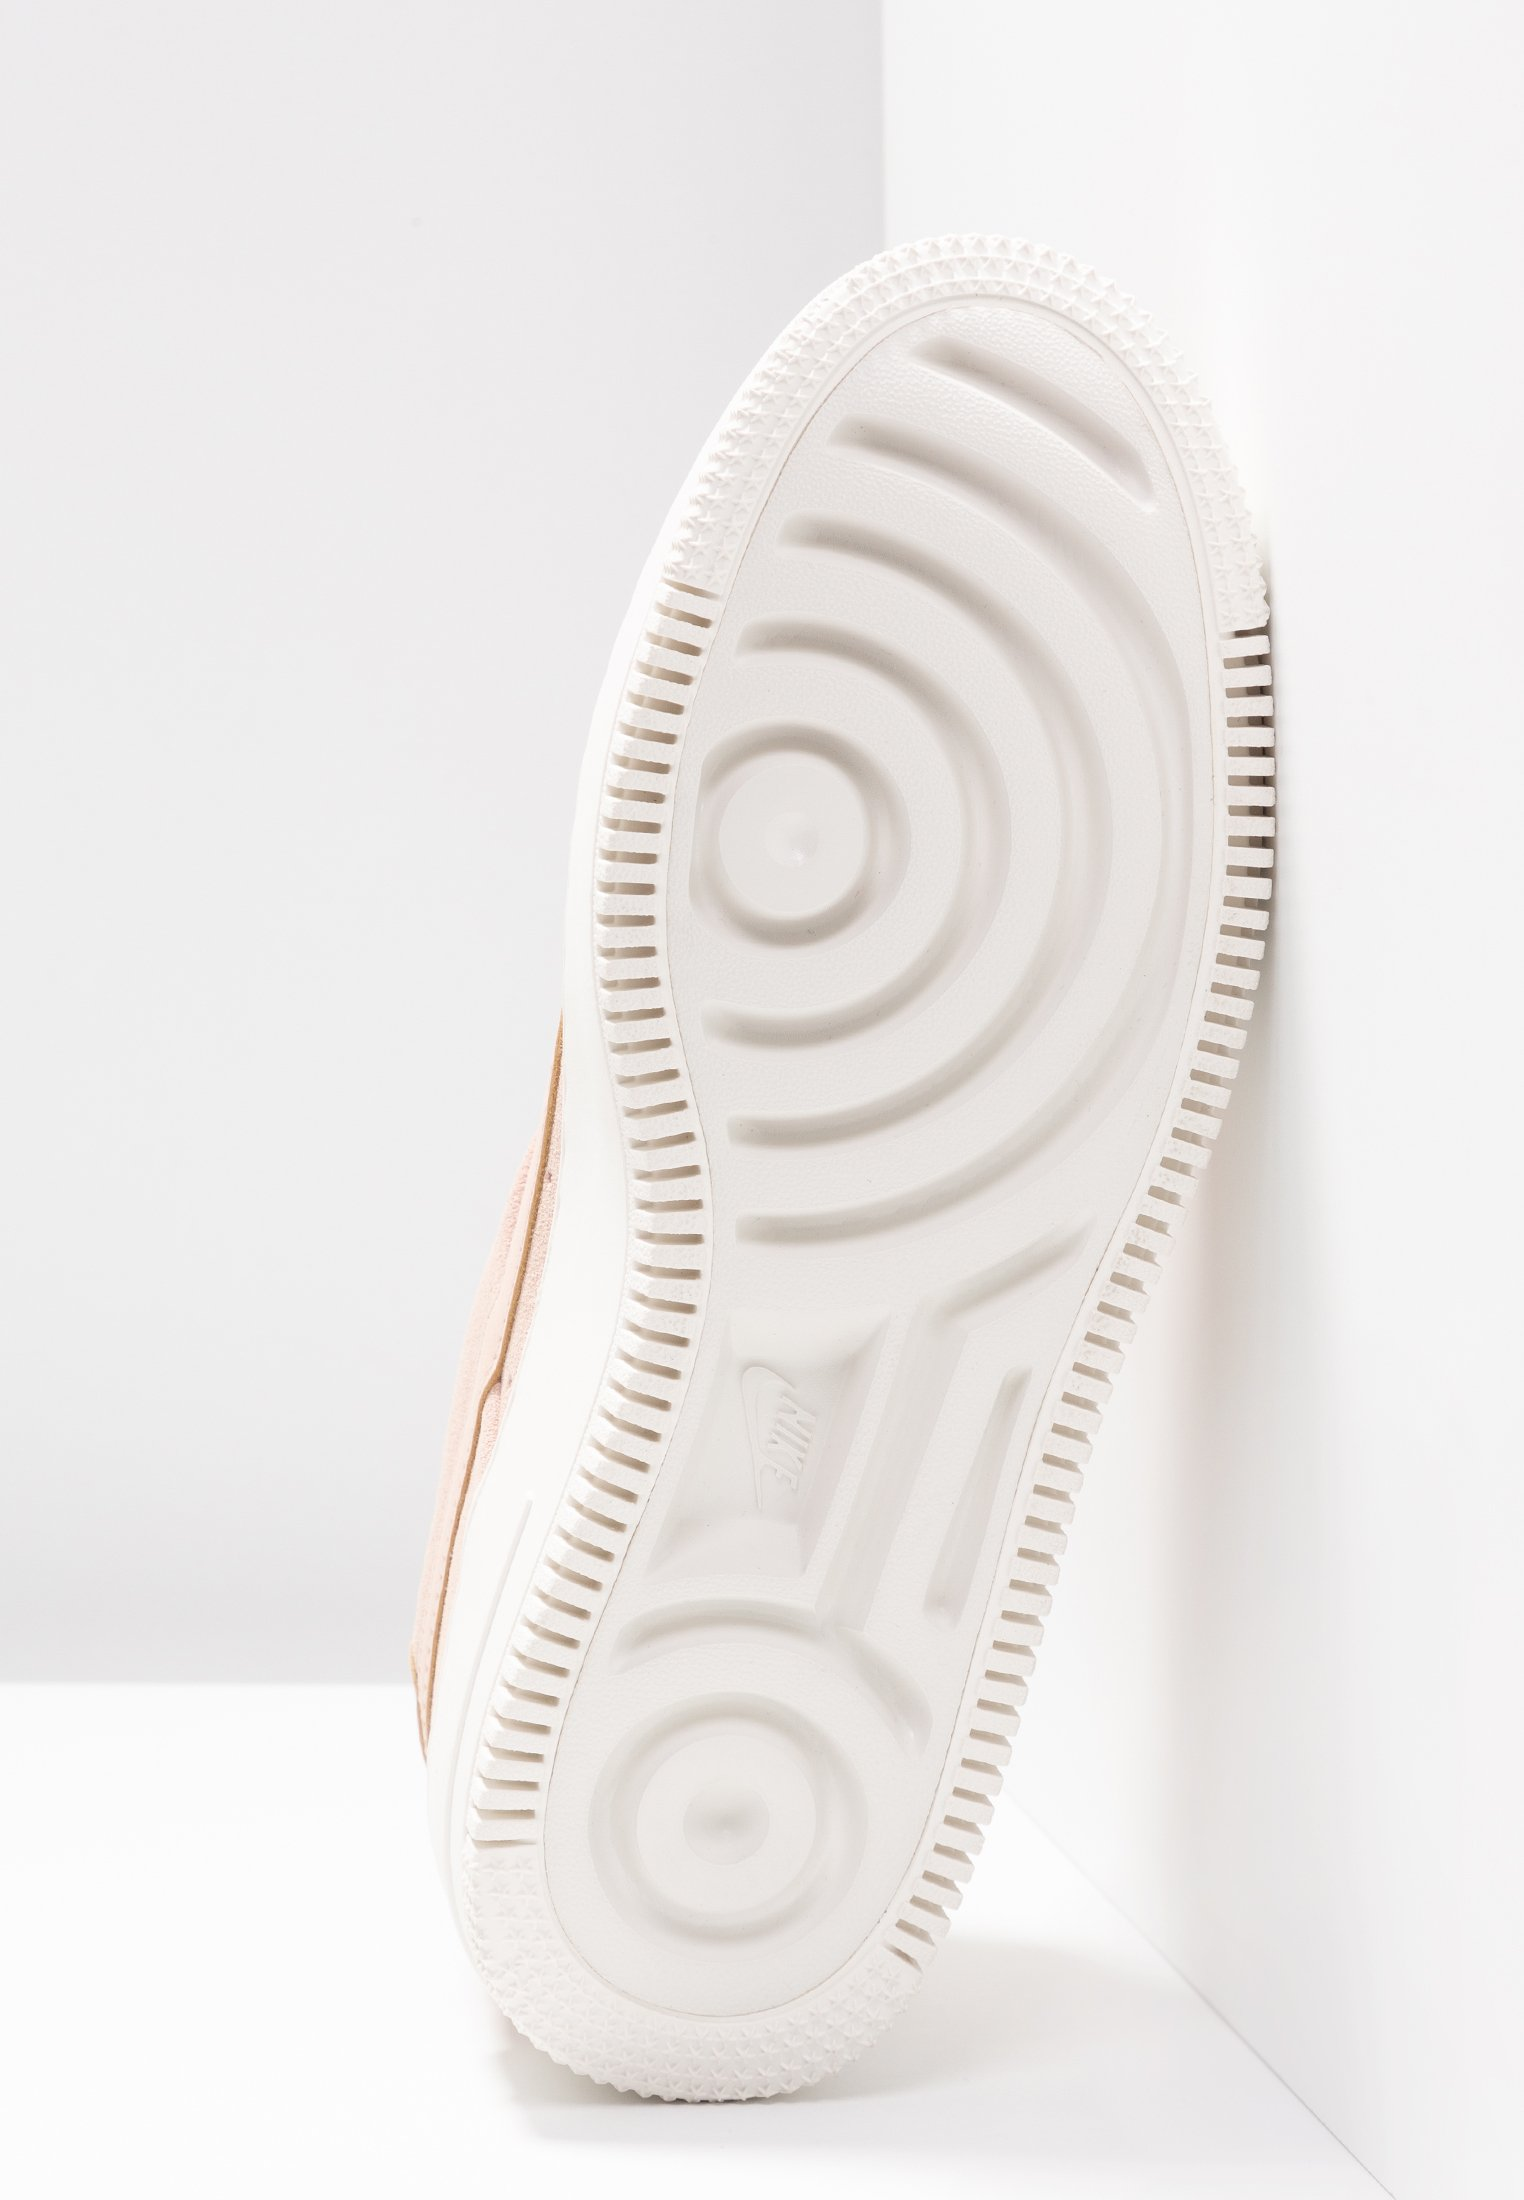 Nike Sportswear Air Force 1 Sage - Sneakers Basse Particle Beige/phantom 89eOaJN